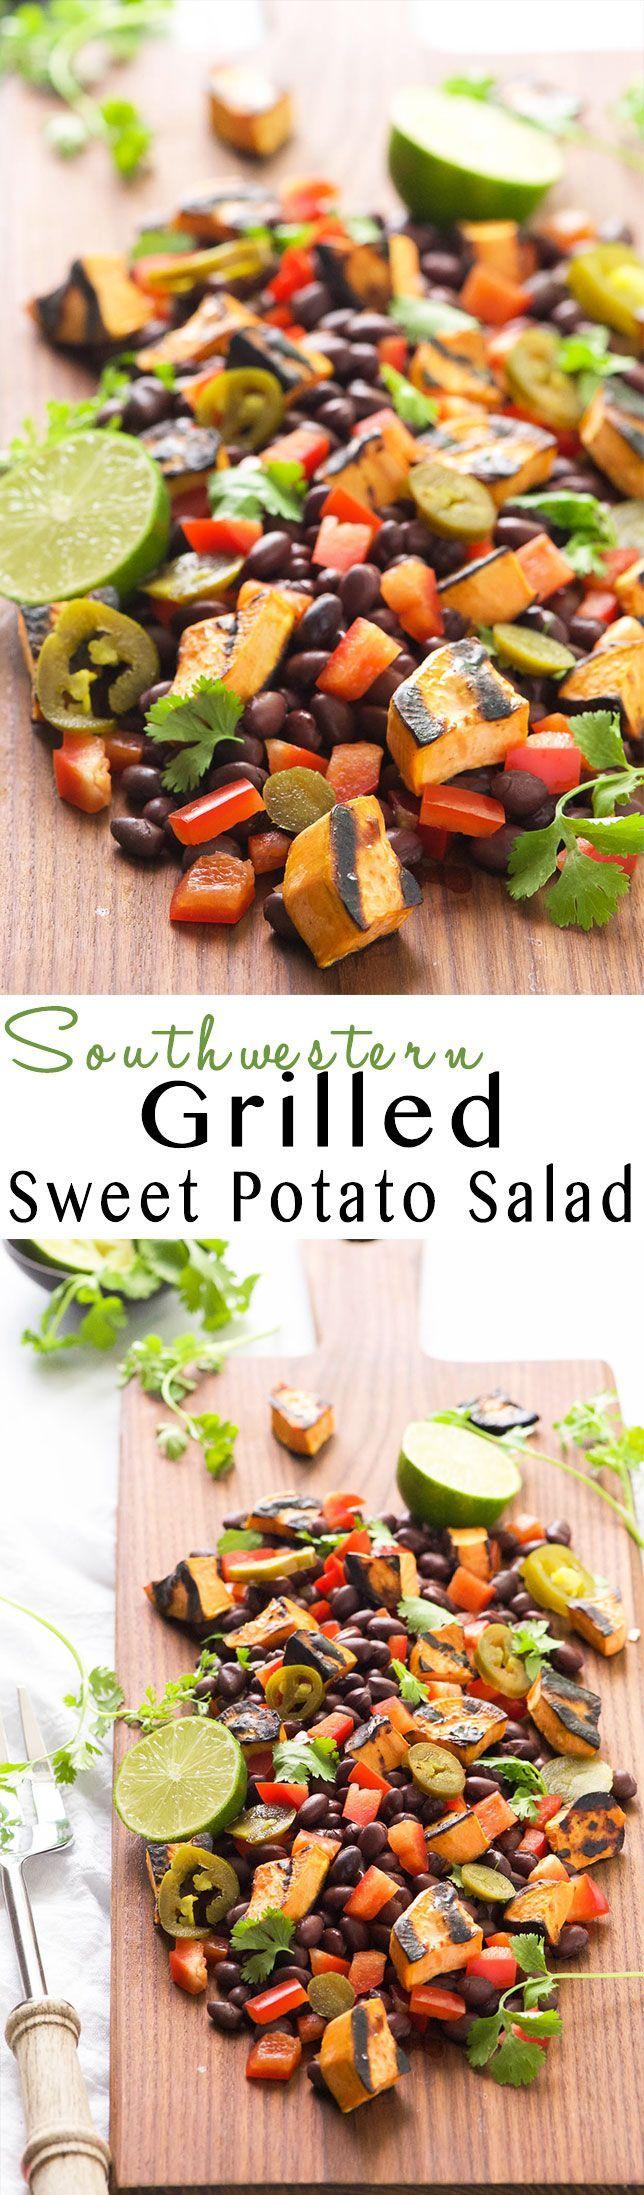 Southwestern Grilled Sweet Potato Salad | Healthy, Gluten Free, Recipes, Black Beans, BBQ, Vegan, Spicy, Easy